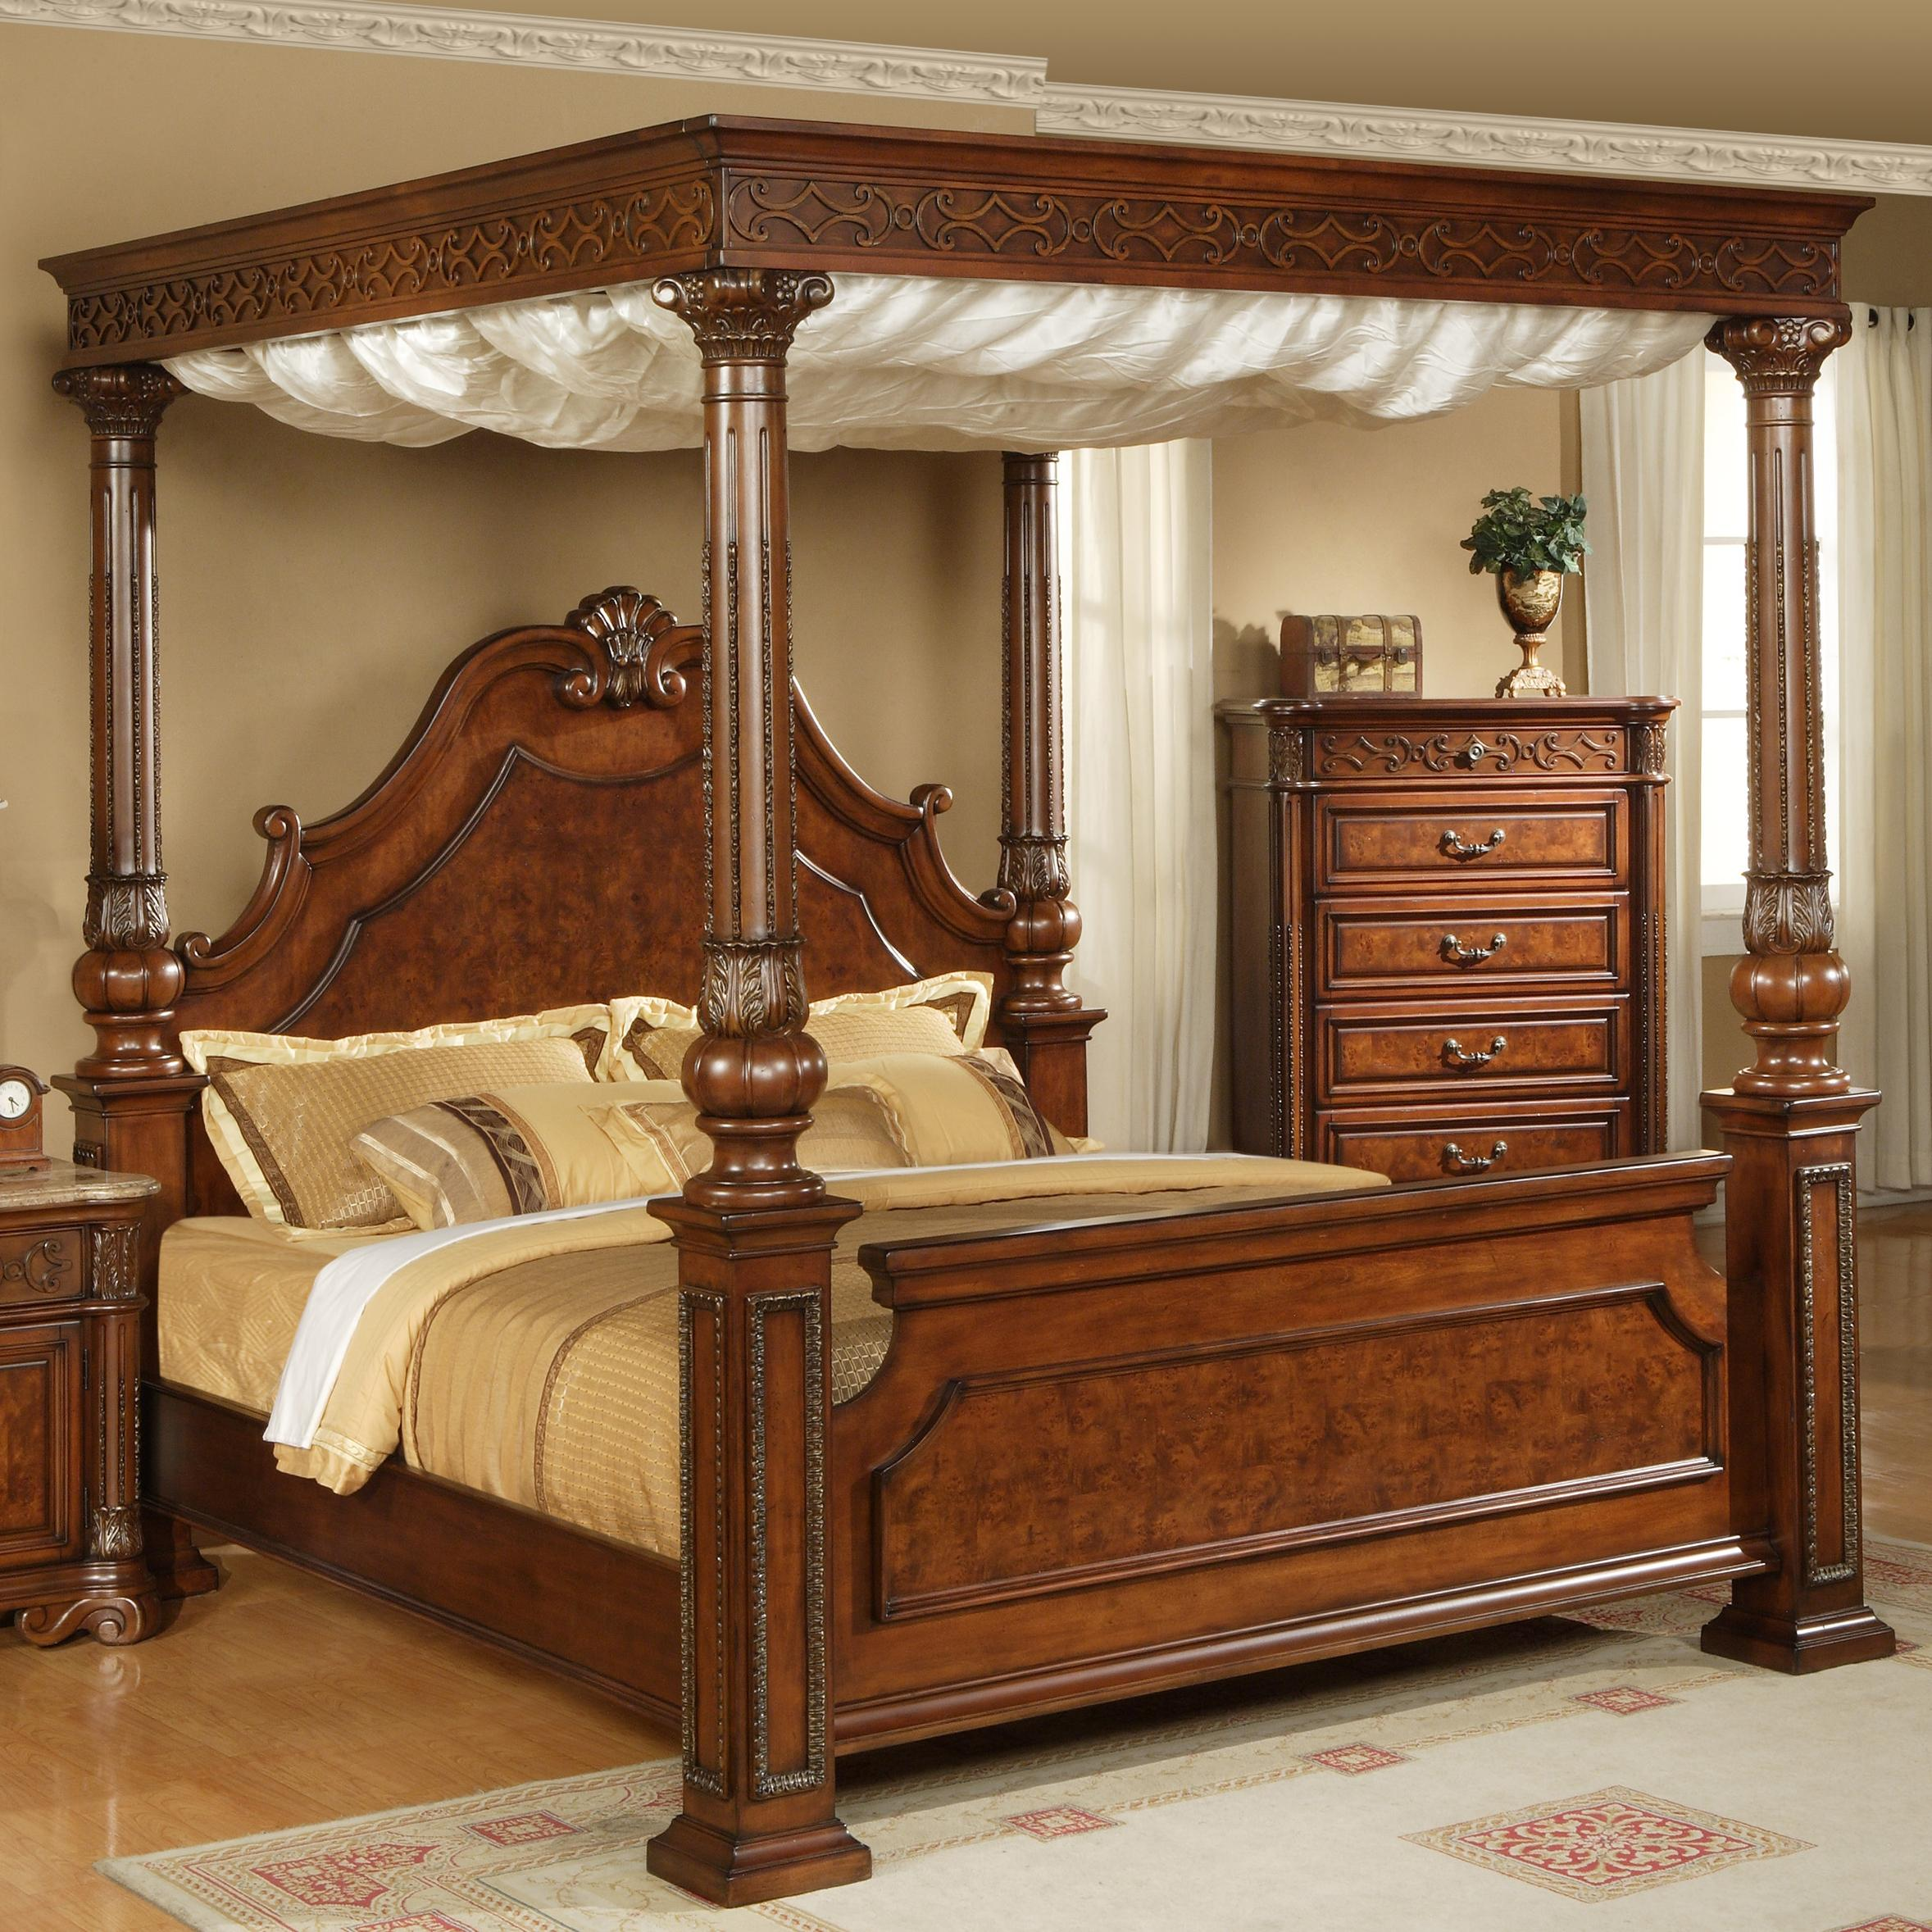 Elements international olivia queen traditional ornate for International bedroom designs